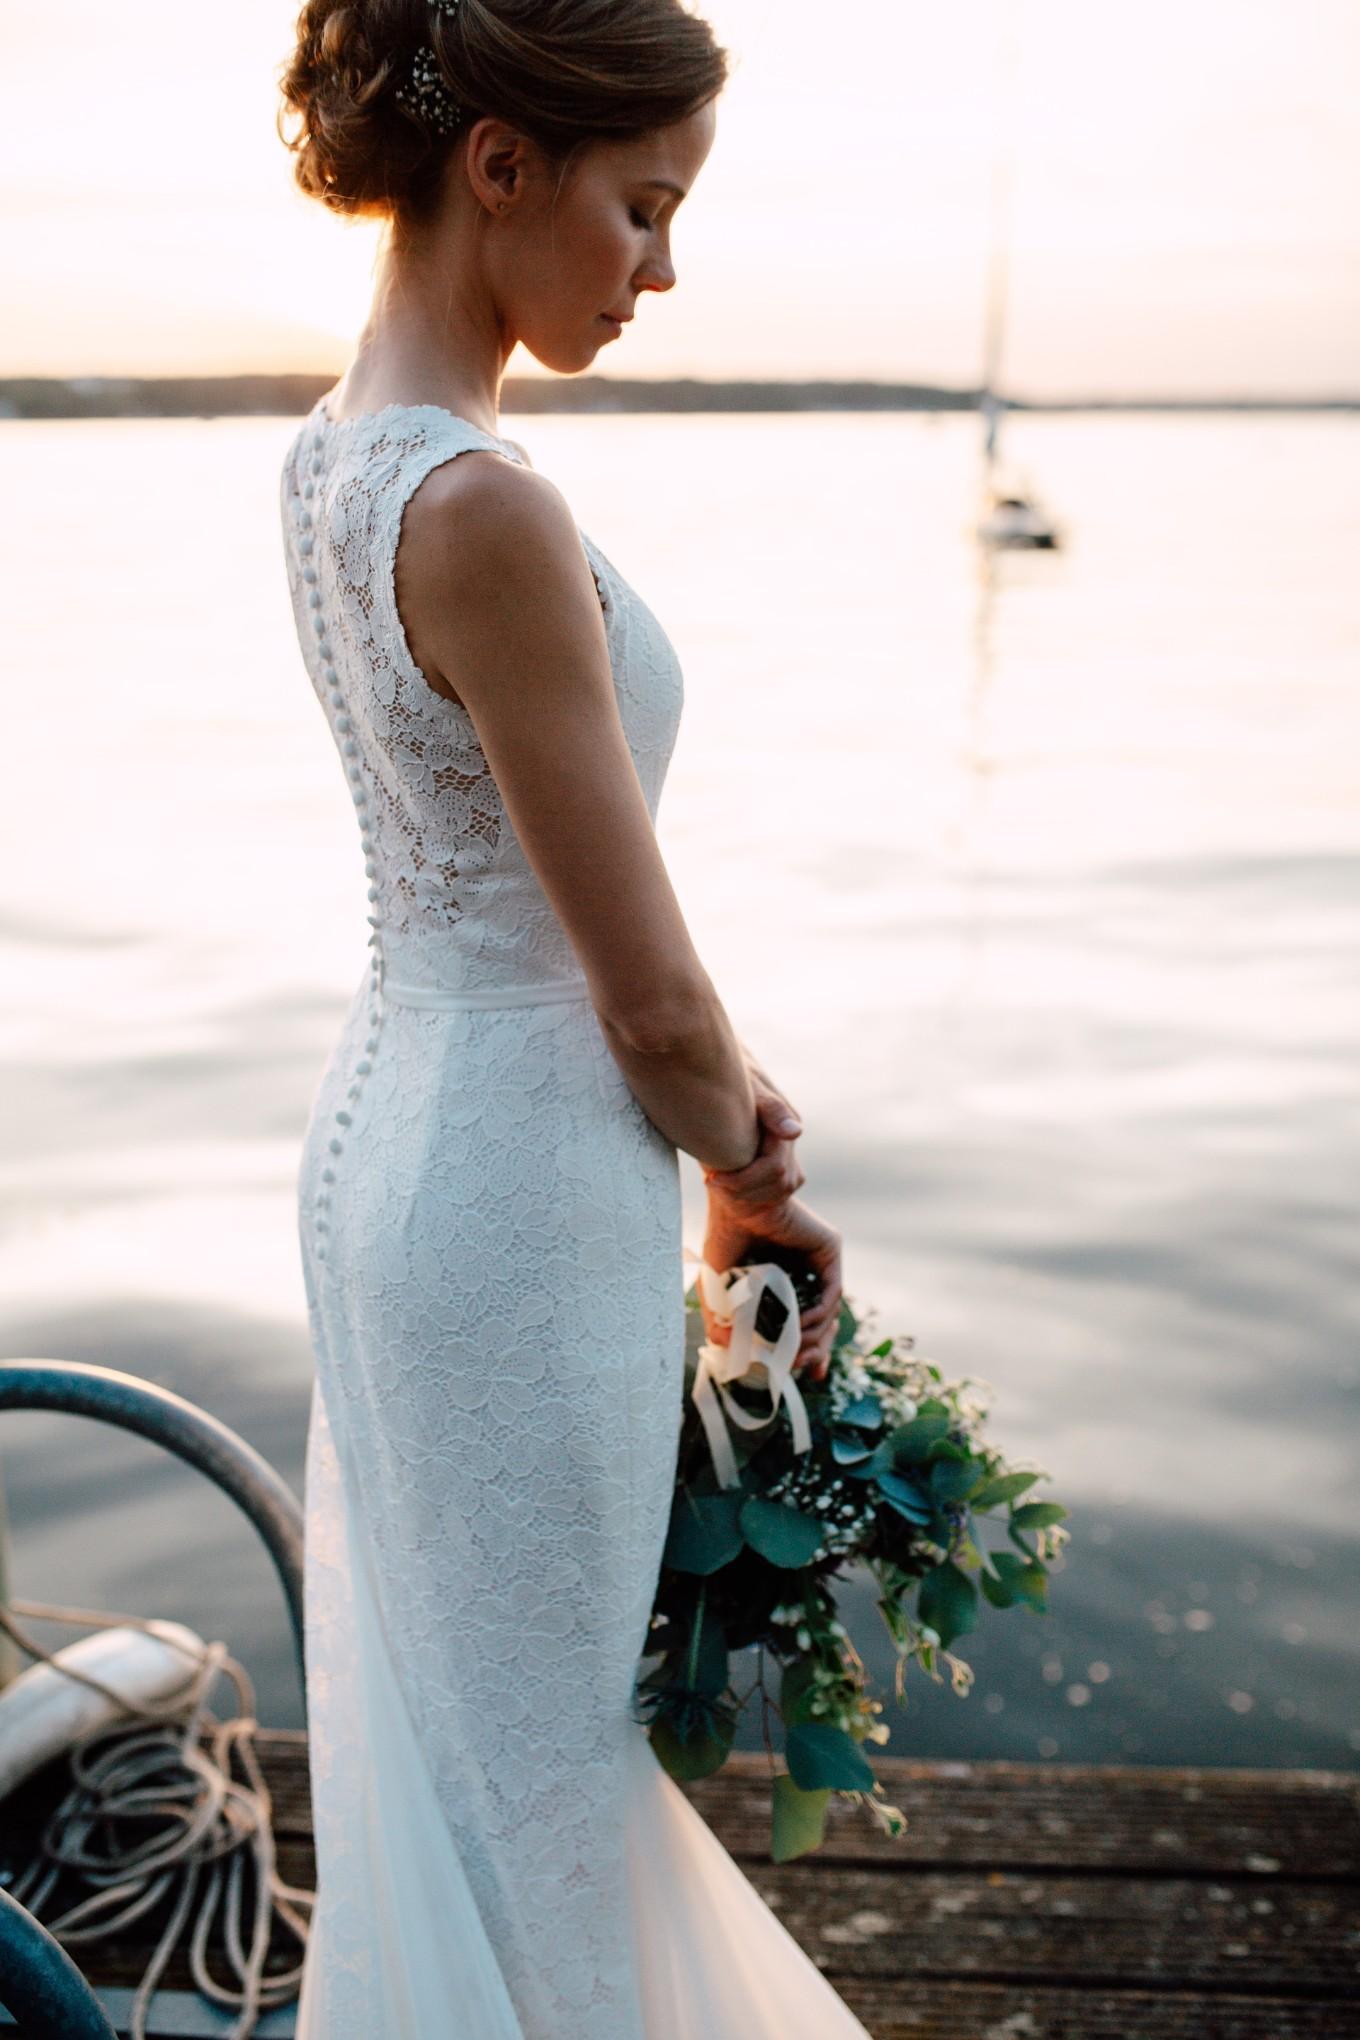 Berlin-Wannsee-Pia-Anna-Christian-Wedding-Photography-ST-85.jpg